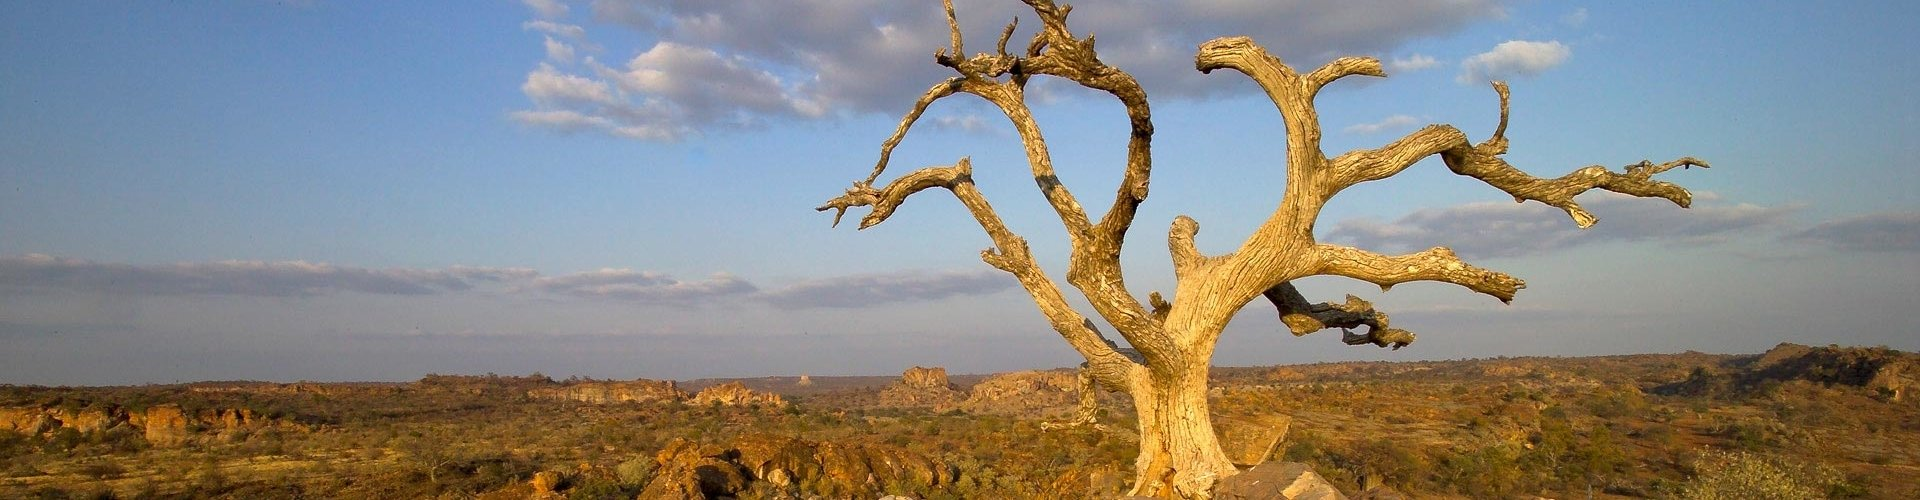 mapungubwe-national-park.jpg